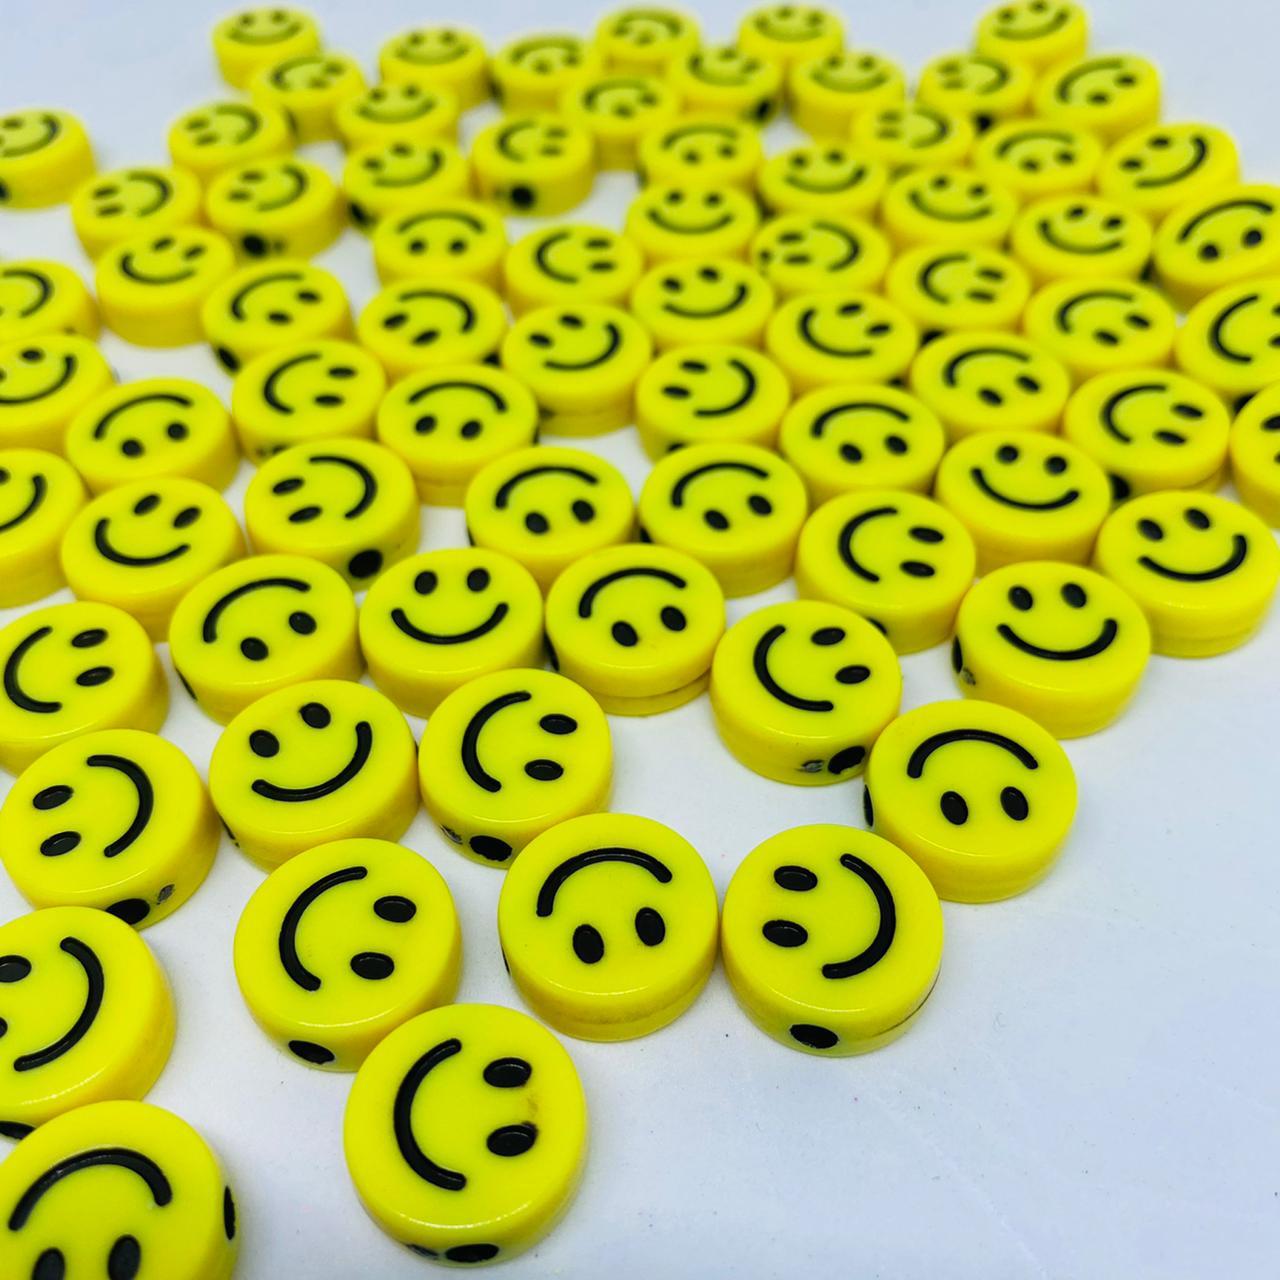 Miçanga - smile amarelo 25 gr   - Palácio Dos Cristais